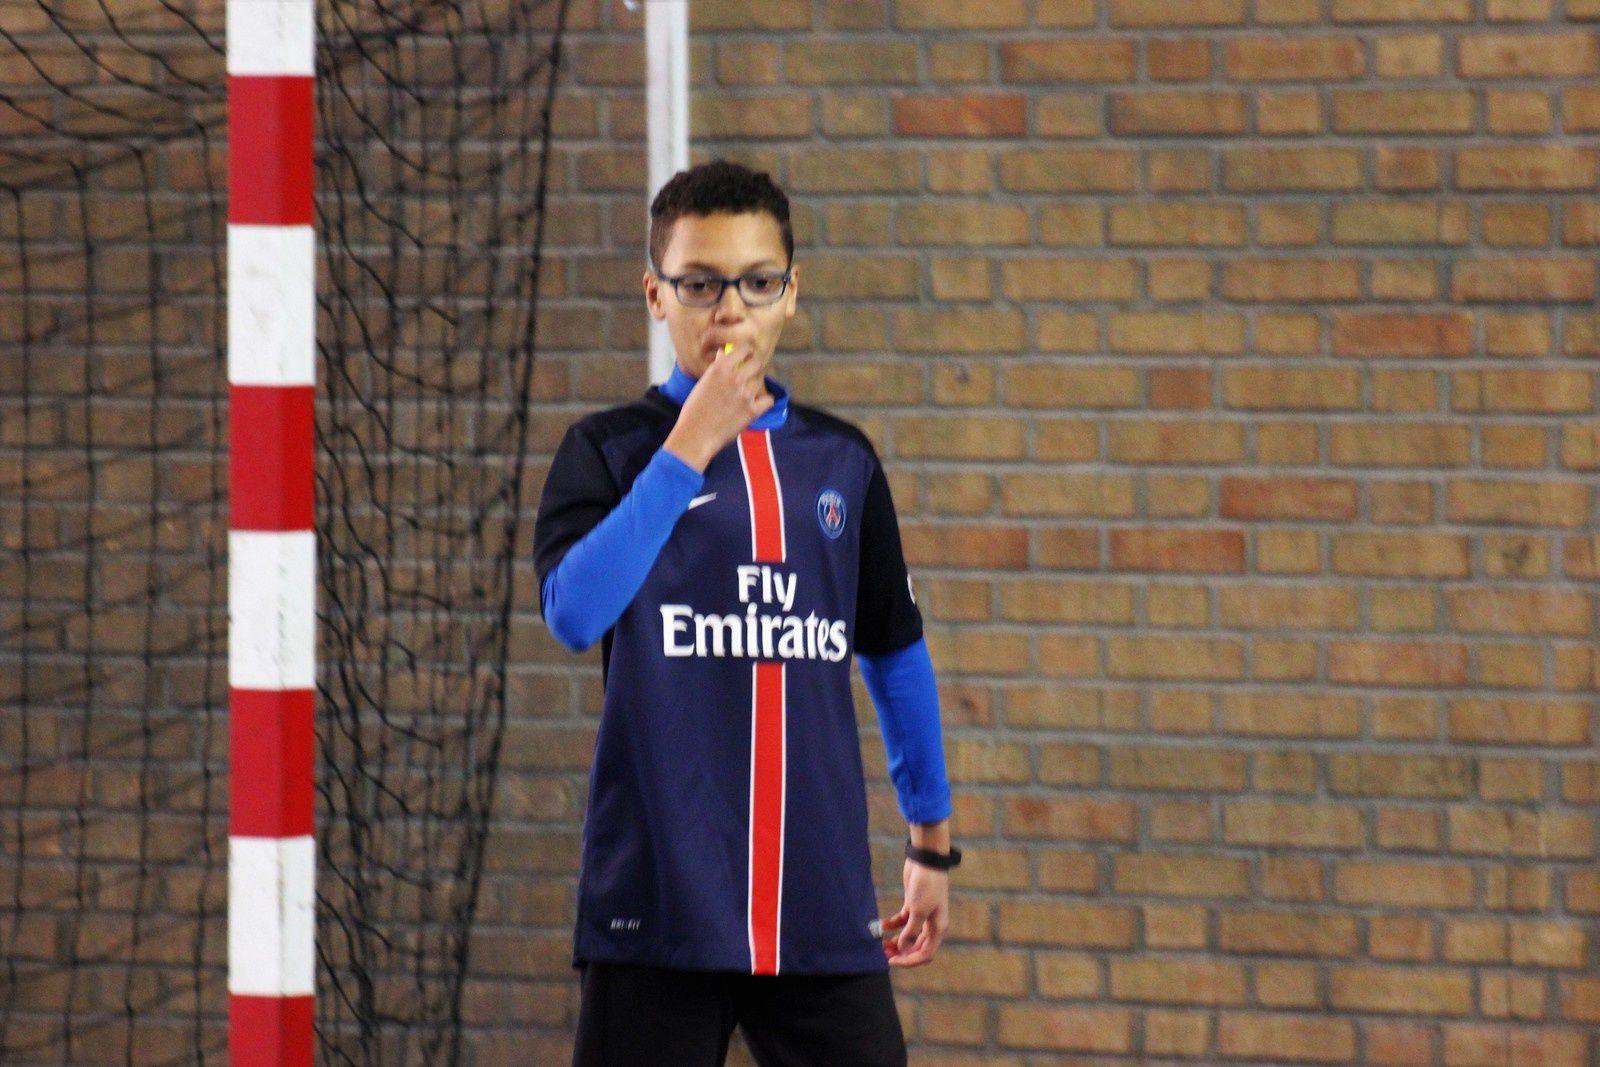 Tounoi Mini-Hand SOR Handball (20.01.2018) 2/2